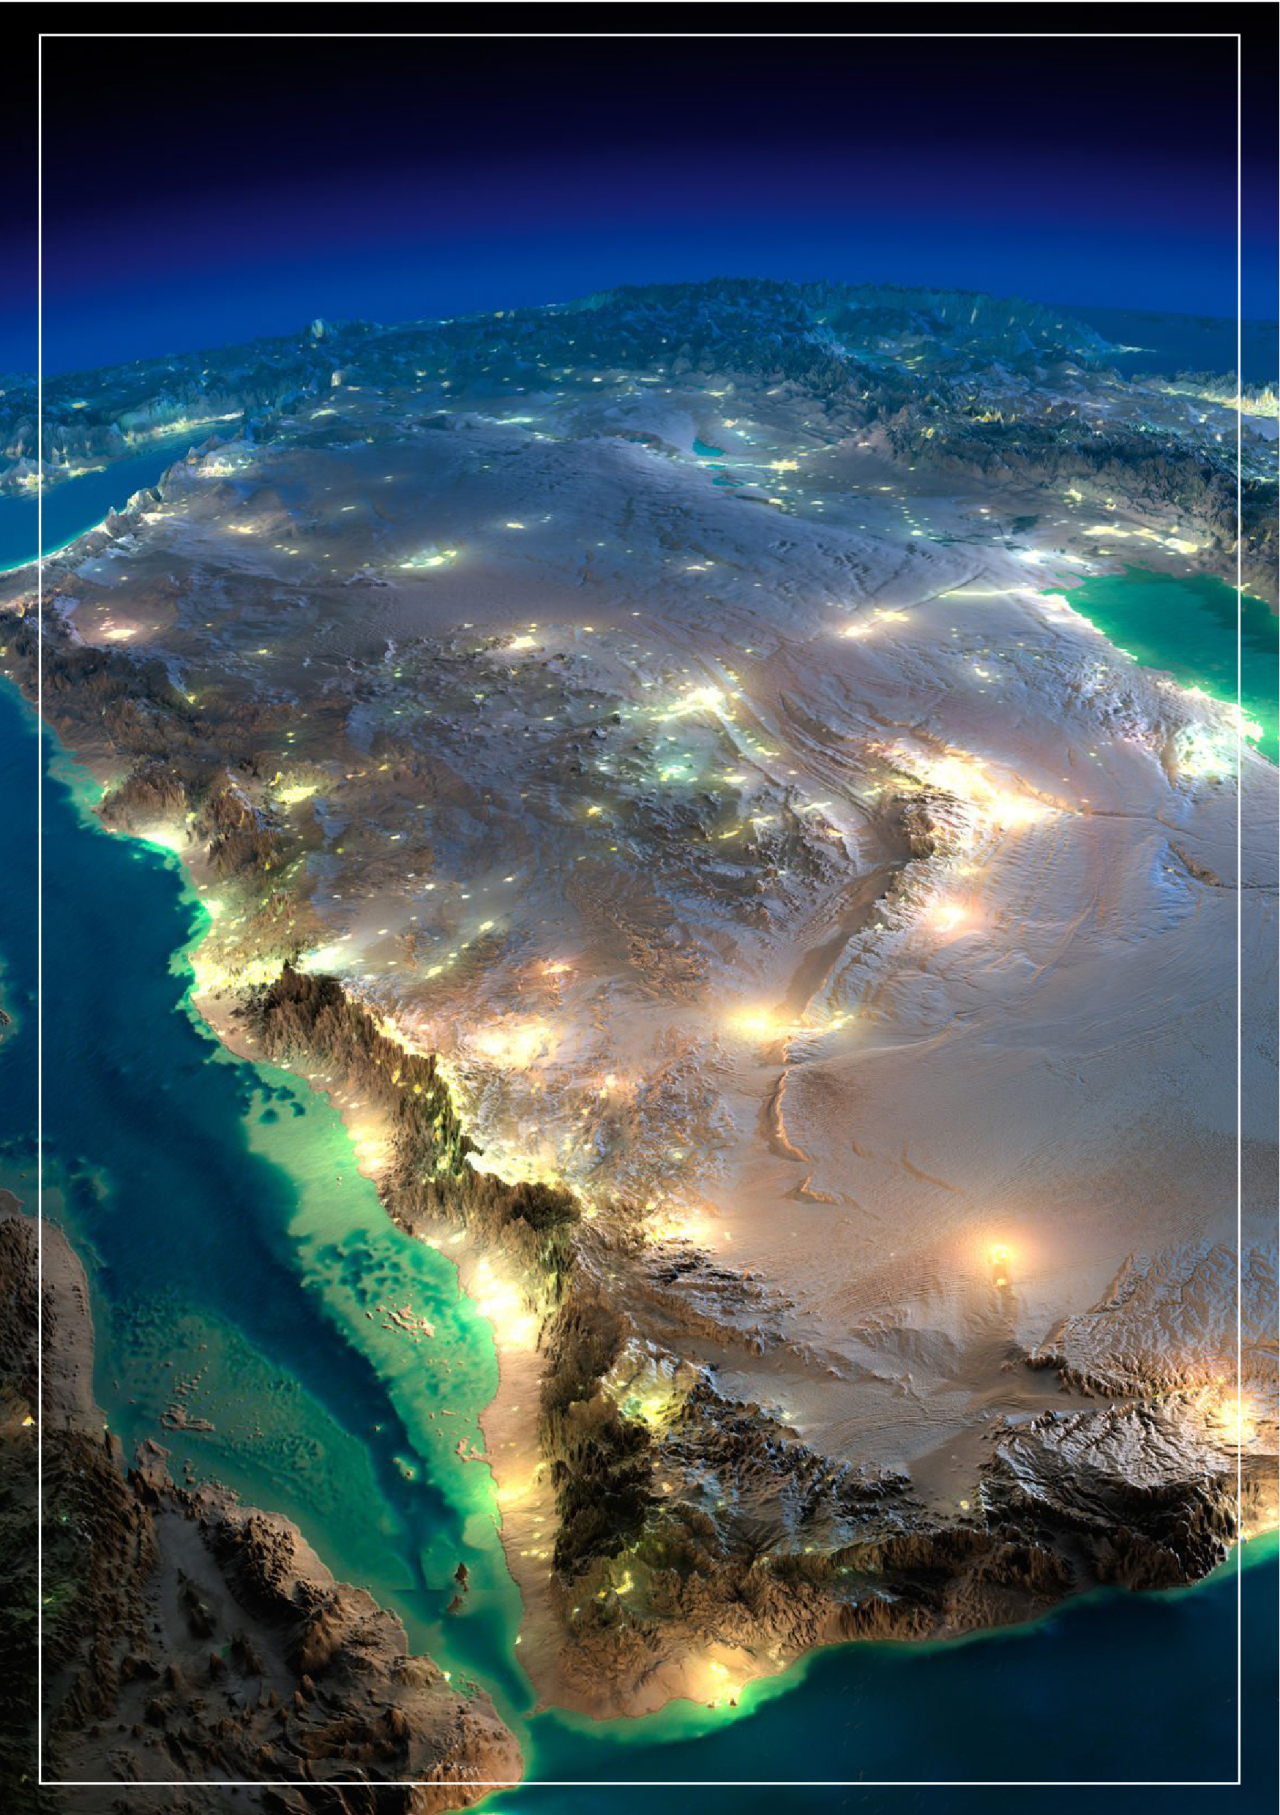 Map of the Kingdom of Saudi Arabia